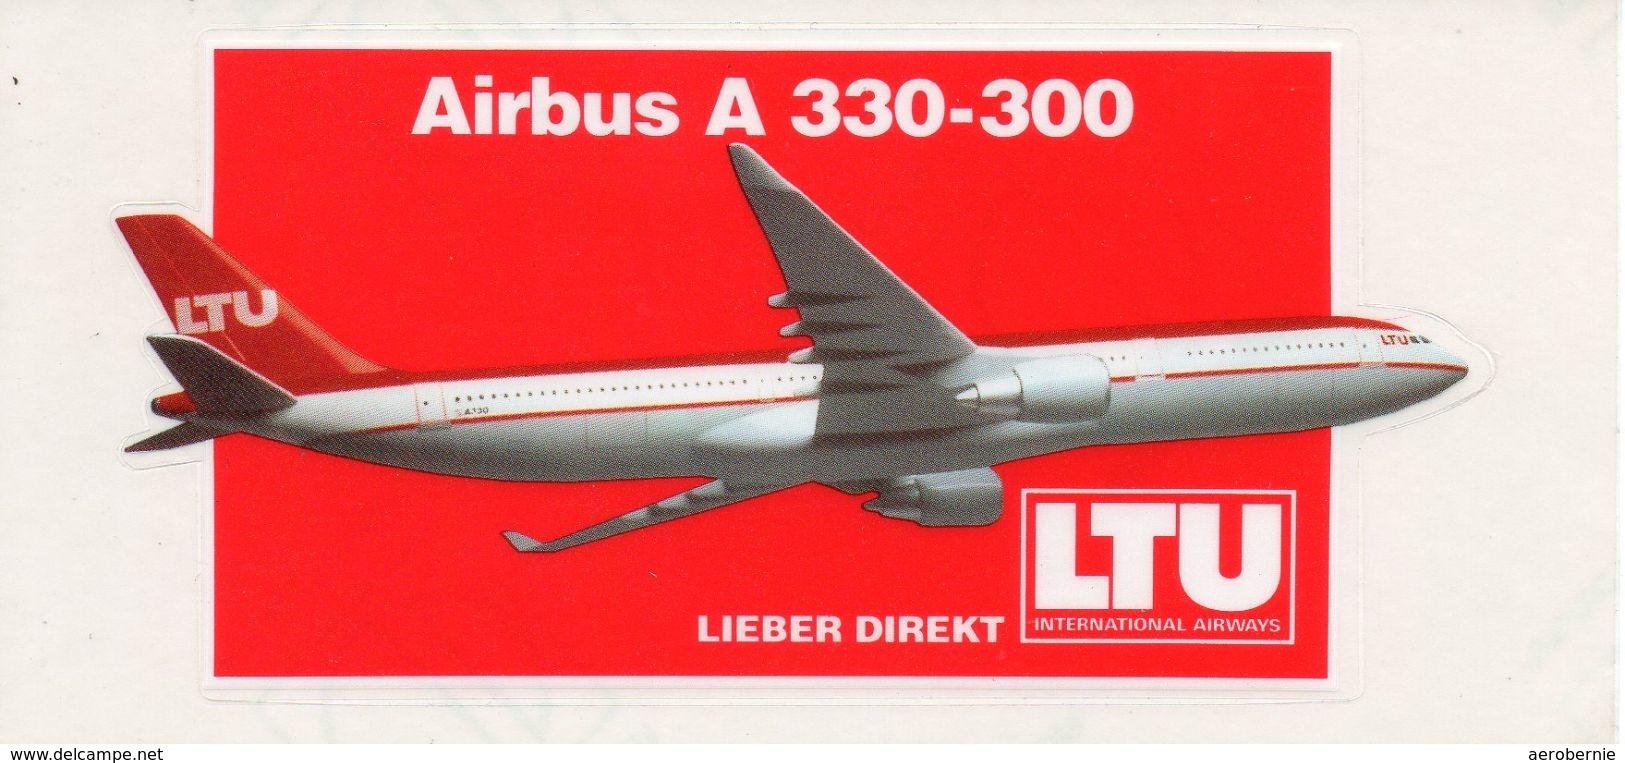 Aufkleber LTU - Airbus A-330 - Aufkleber